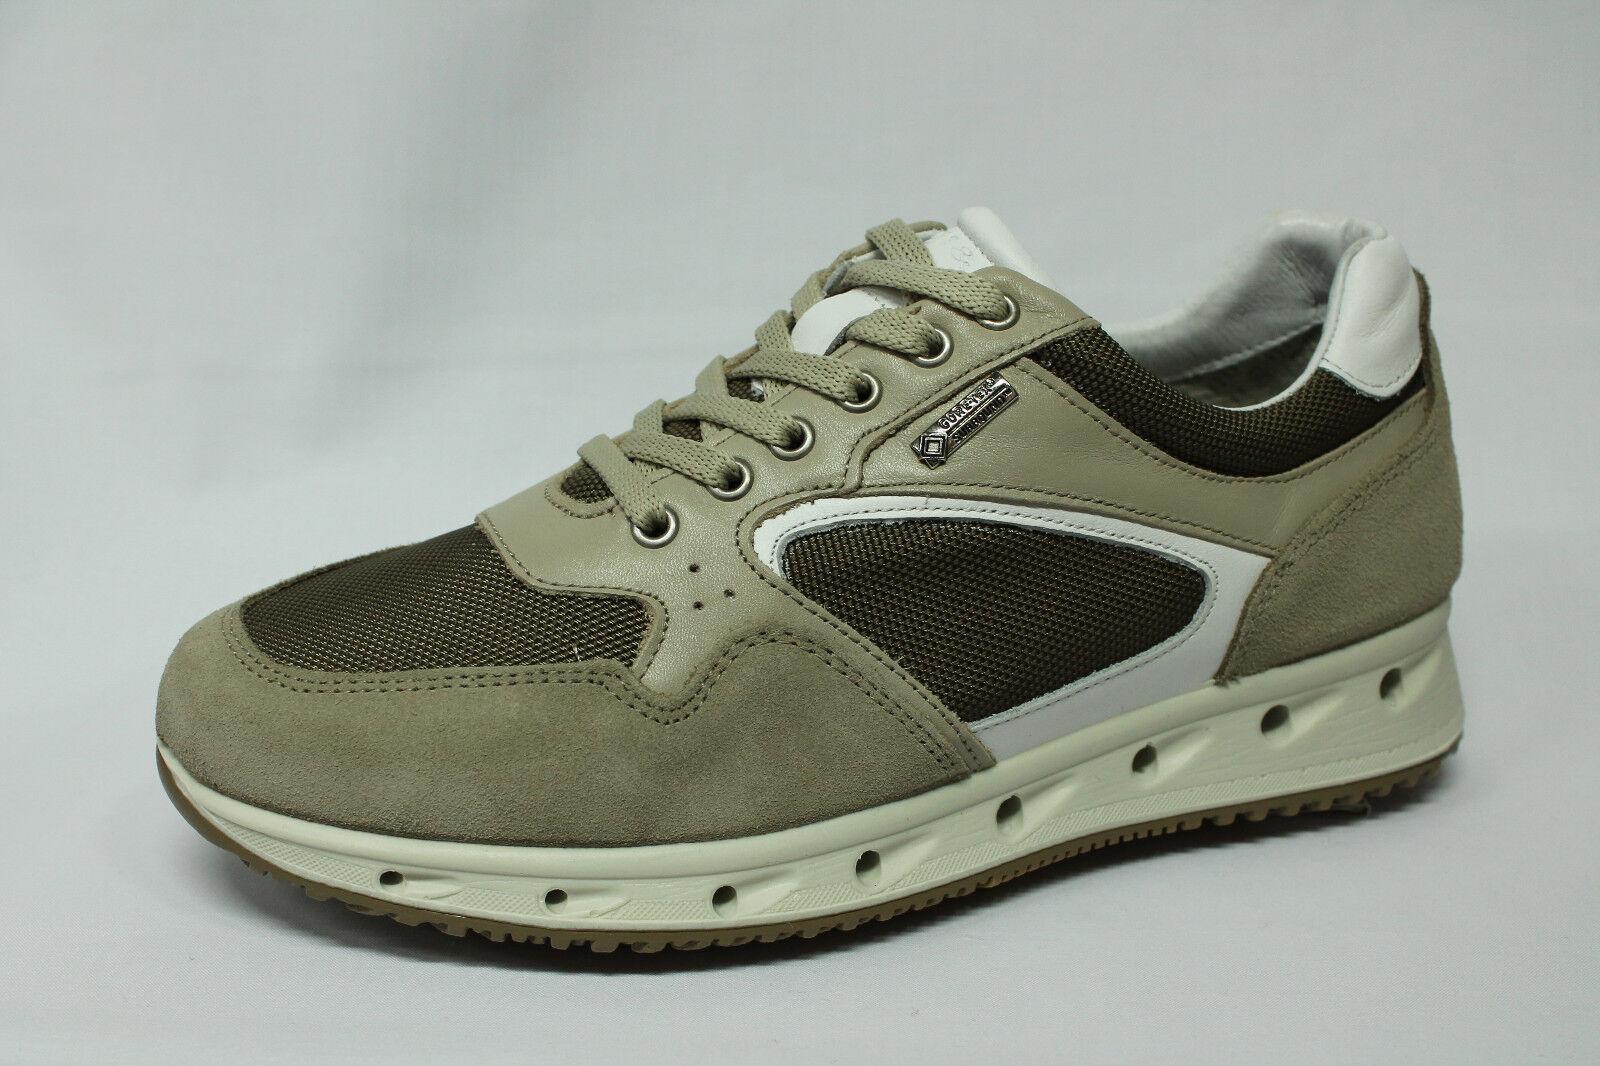 Sneakers Igi&co 1119022 1119022 1119022 pelle e tessuto beige Gore Tex Surround Made in Italy 45c348